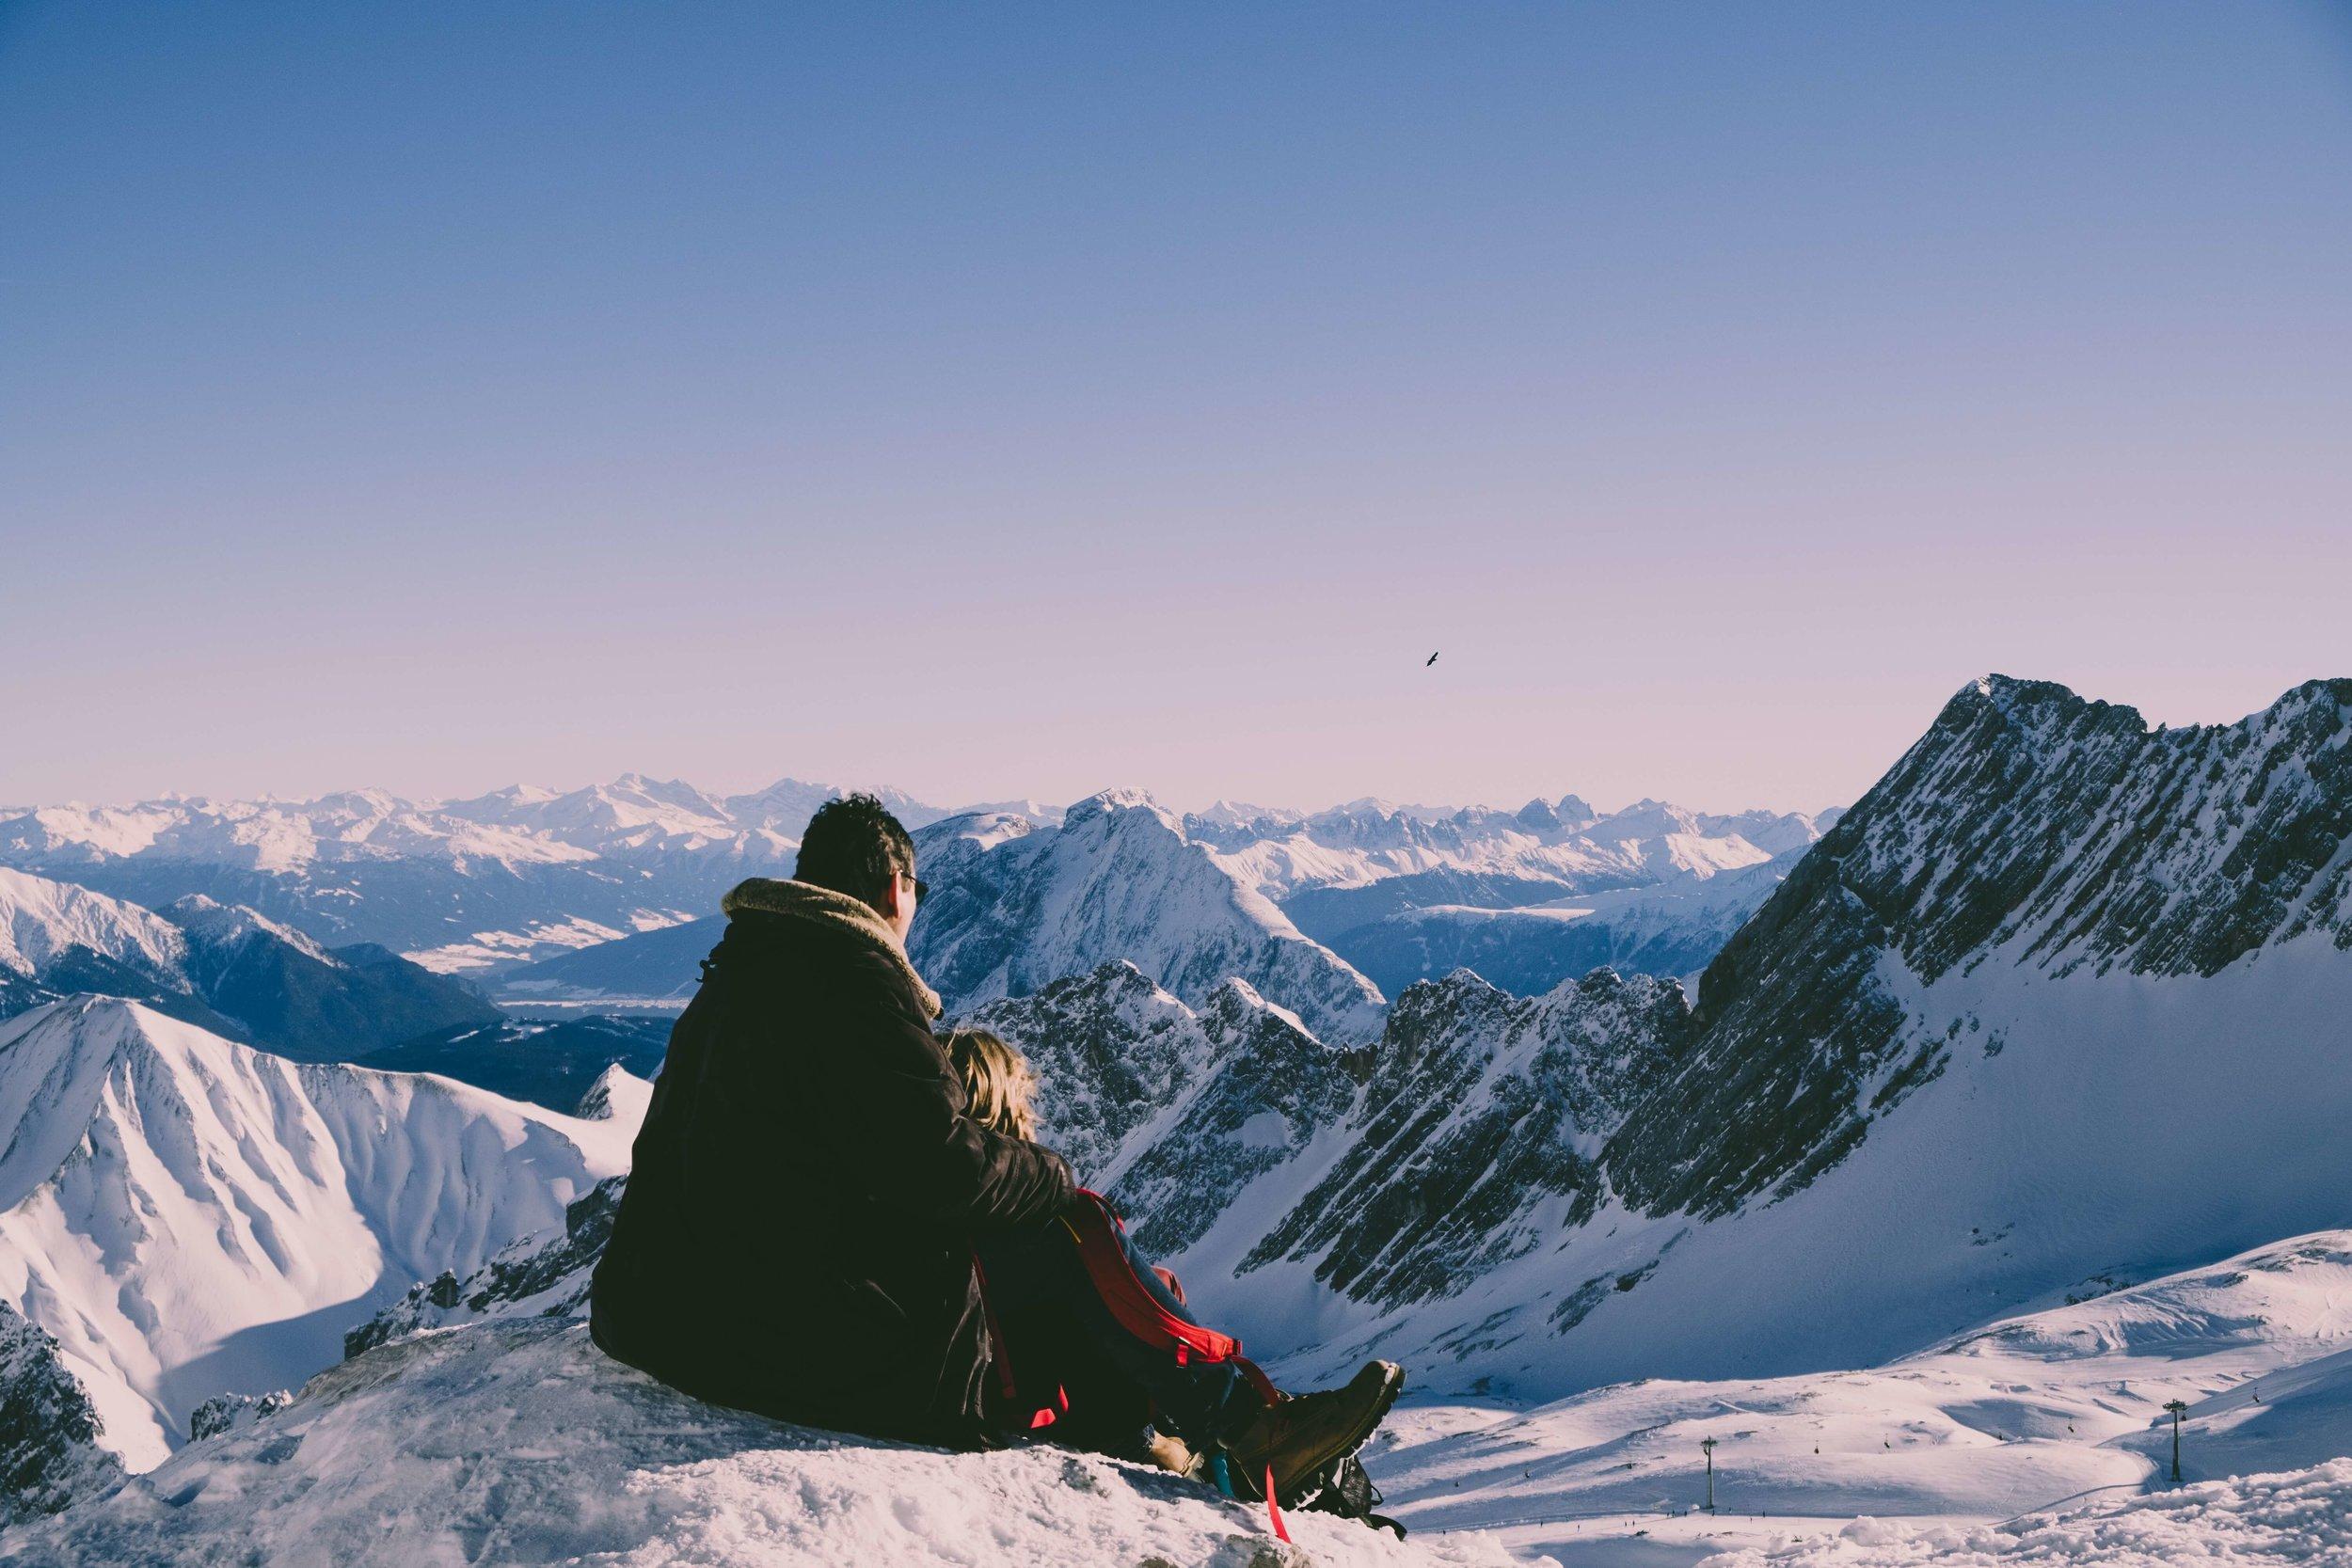 Bulgaria – snowboarding